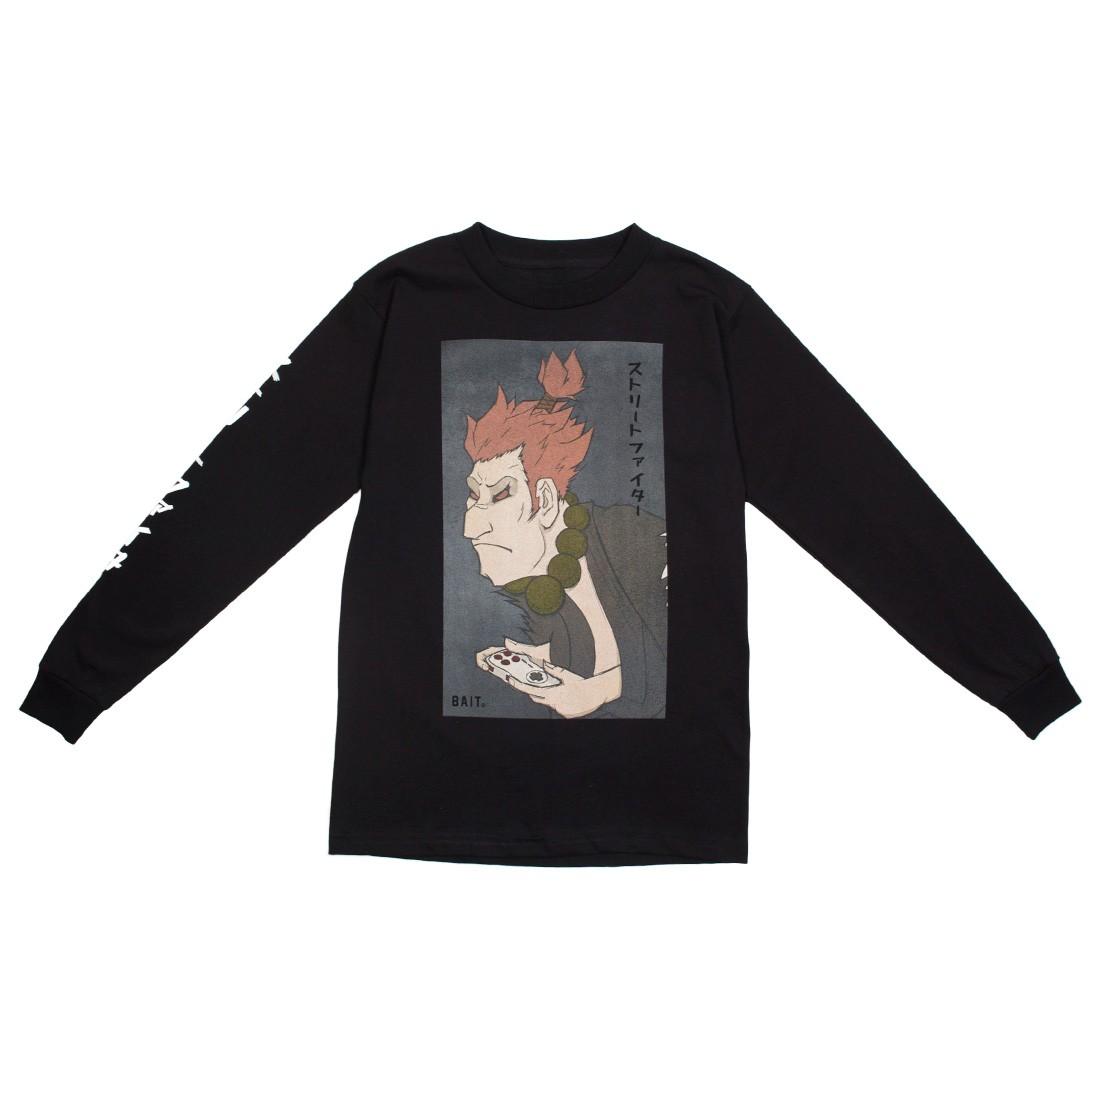 BAIT x Street Fighter x Kidokyo Men Akuma Long Sleeve Tee (black)